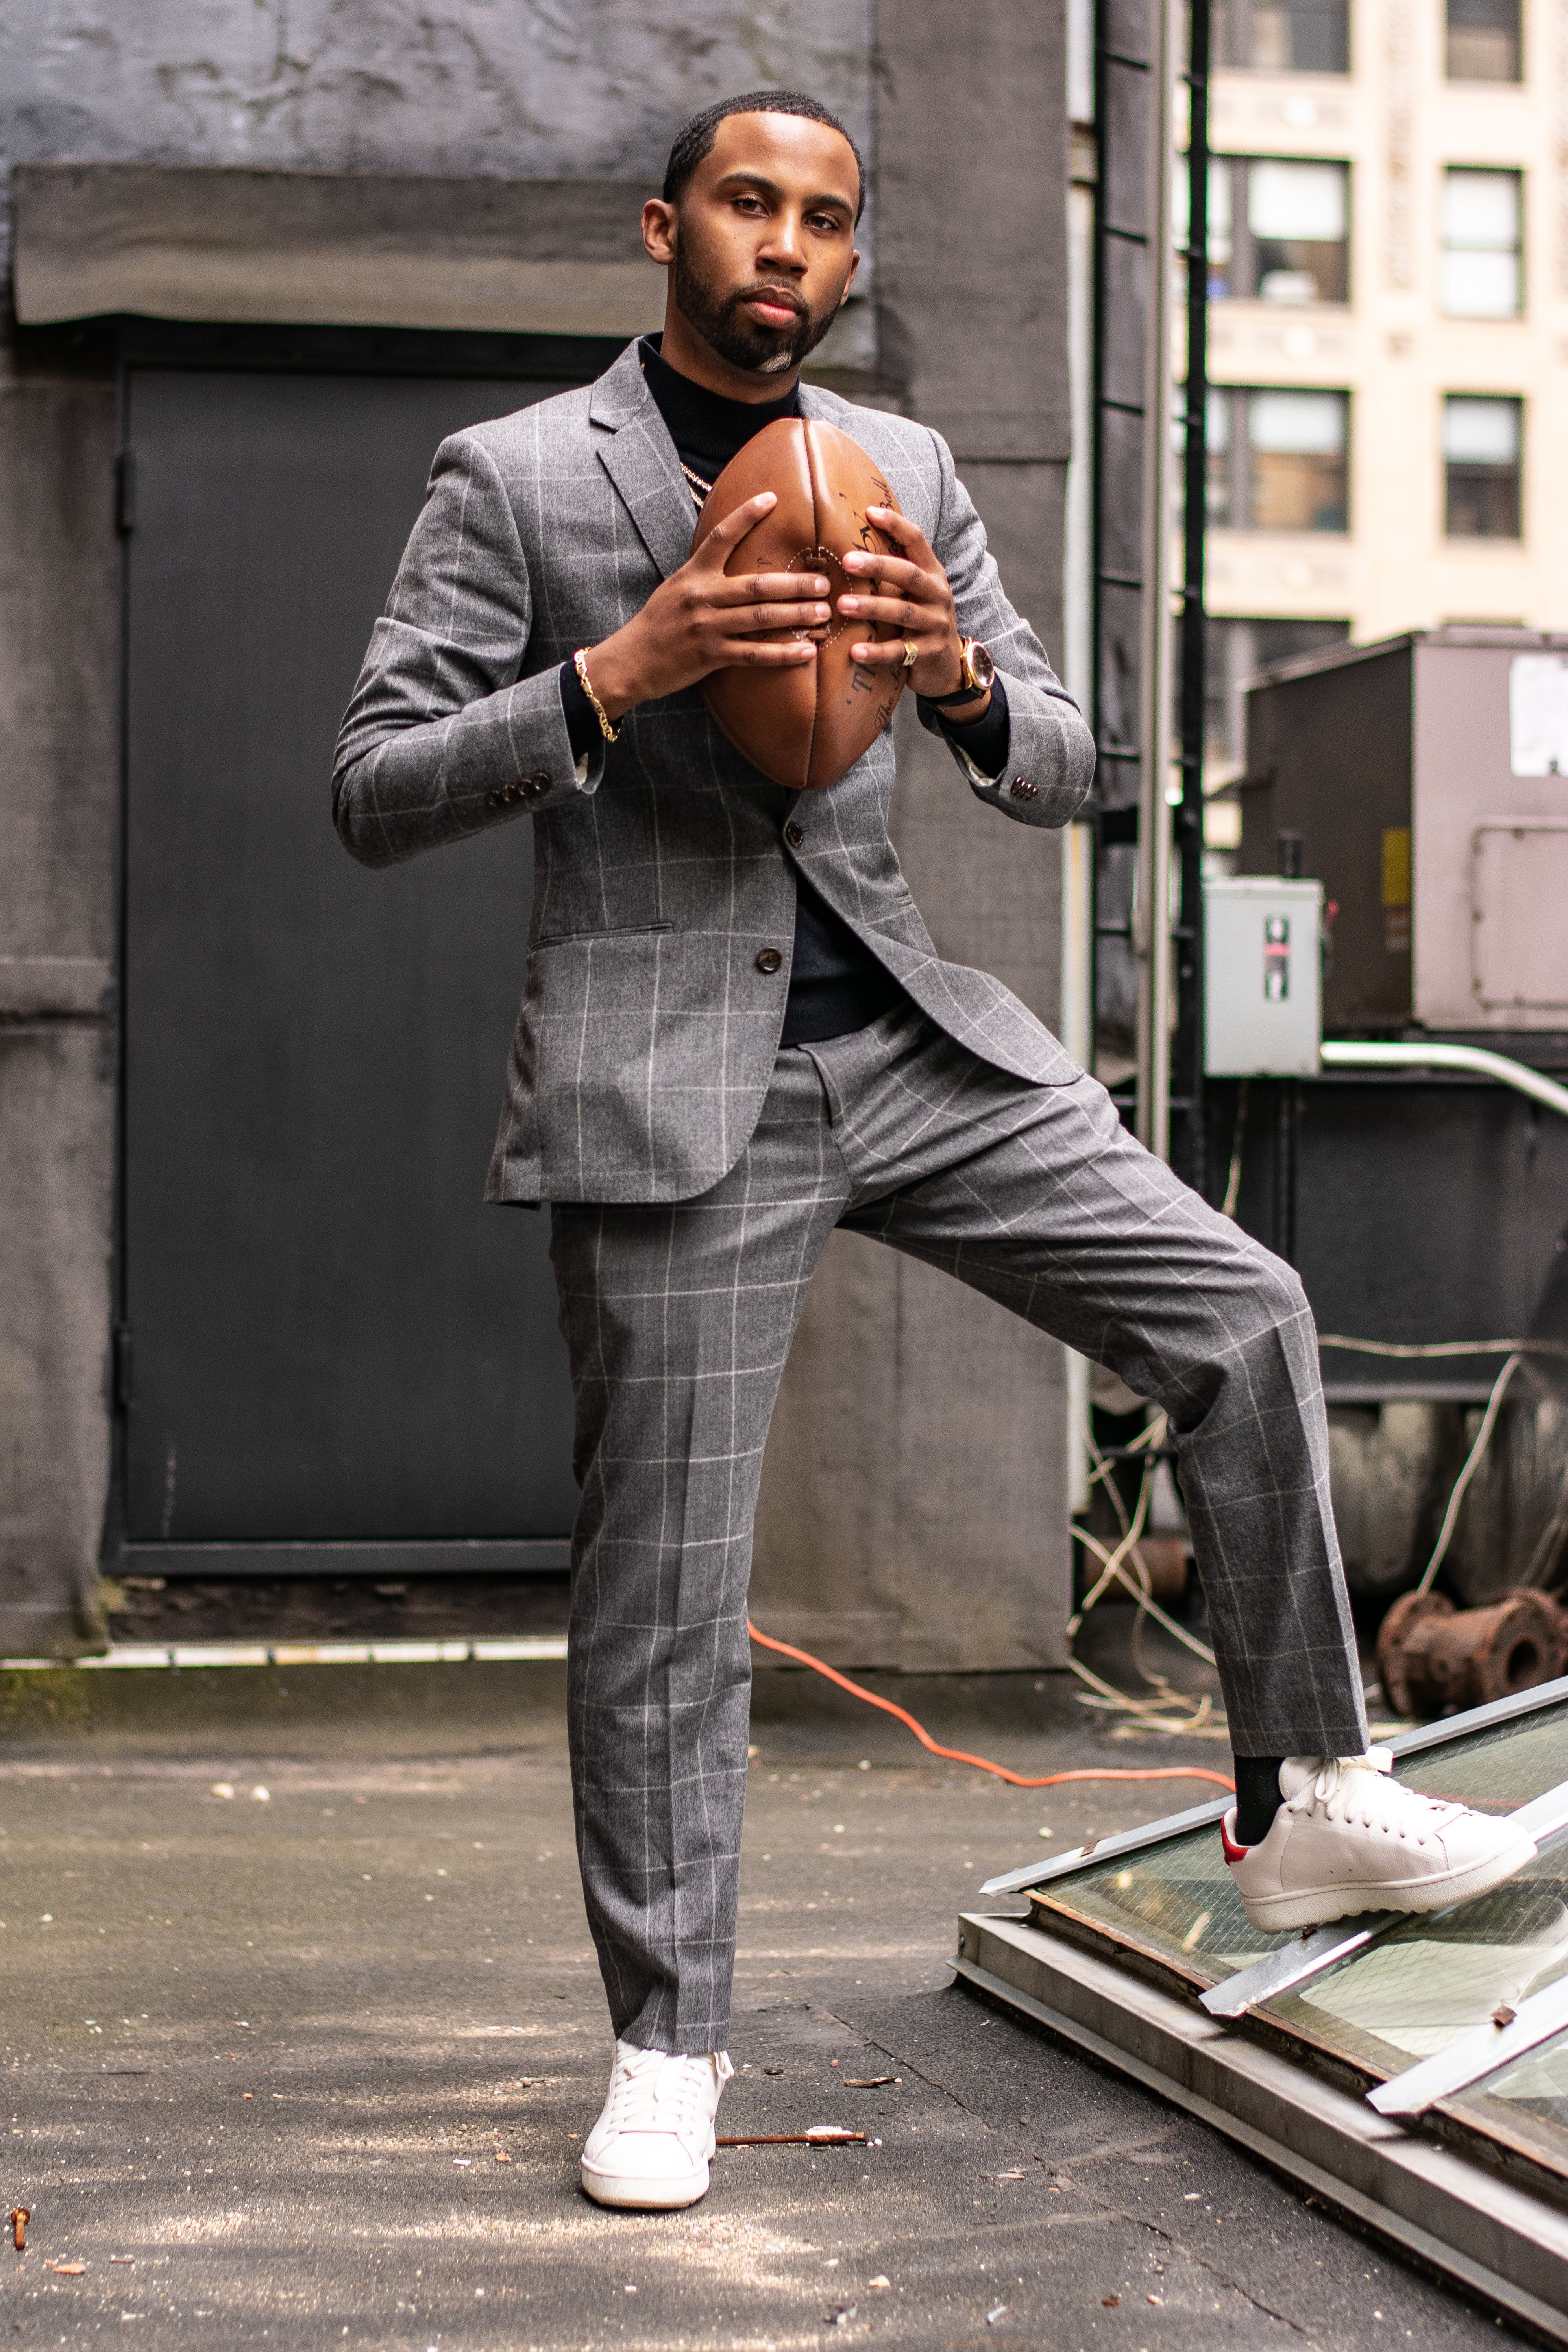 Foto stok gratis fashion, laki-laki, memakai, pemain sepak bola